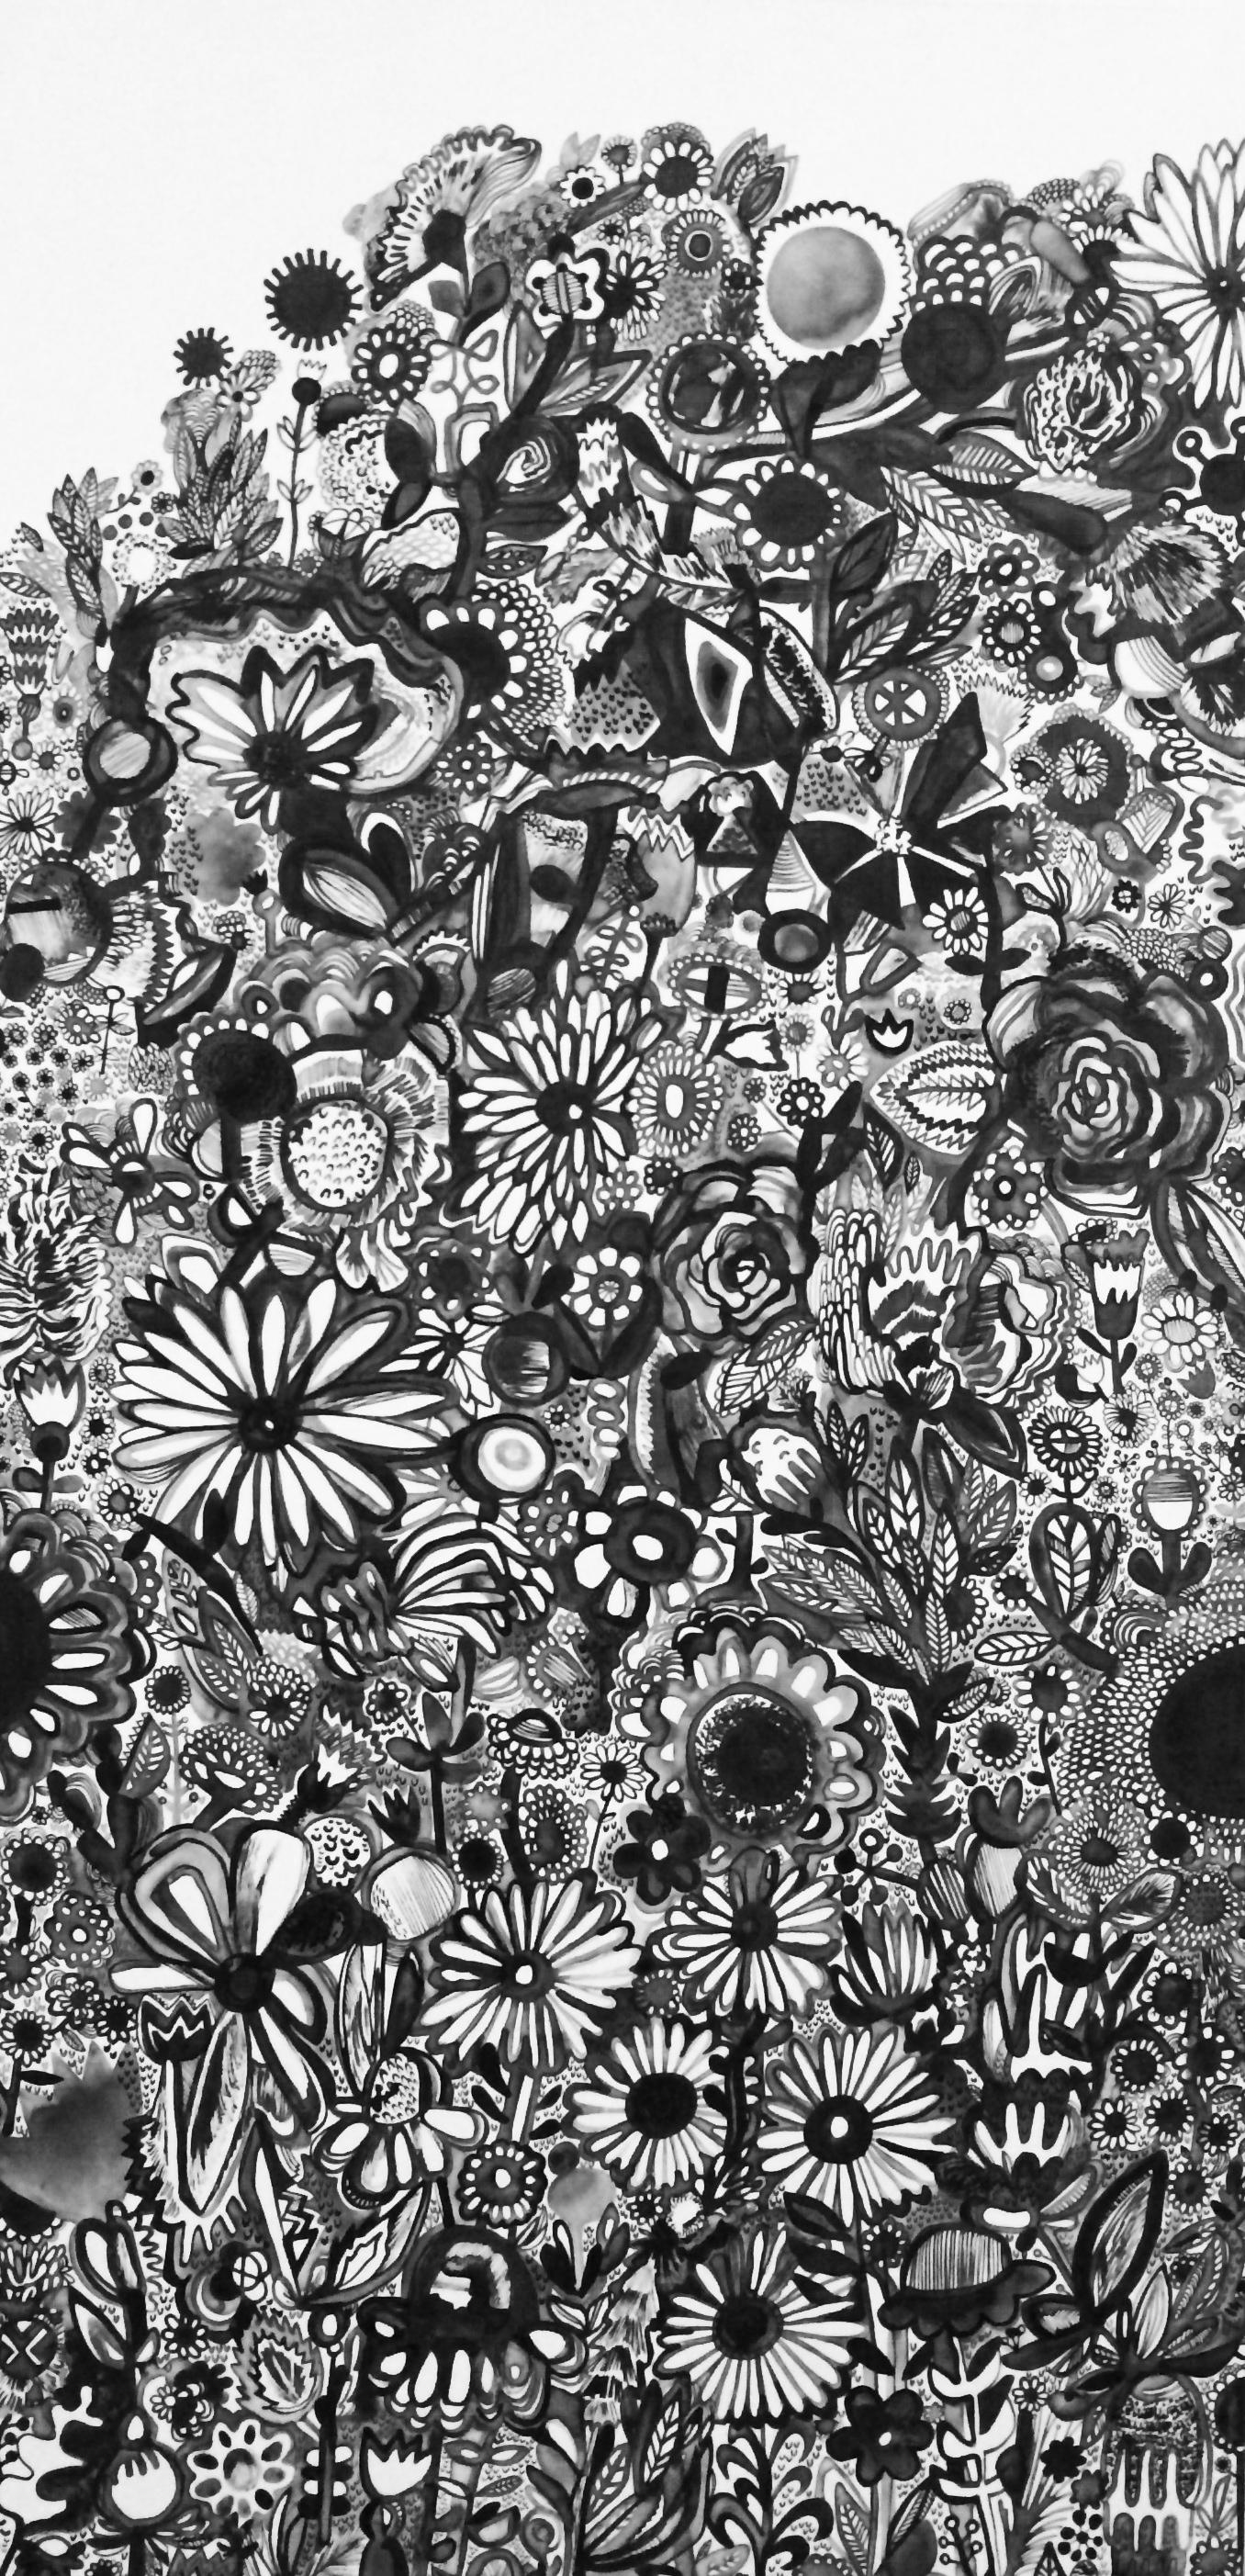 "Rebeca Raney   Flower Power,  2014   Ink on panel   36"" x 18""   Retail Value: $1,000   Opening Bid: $350"